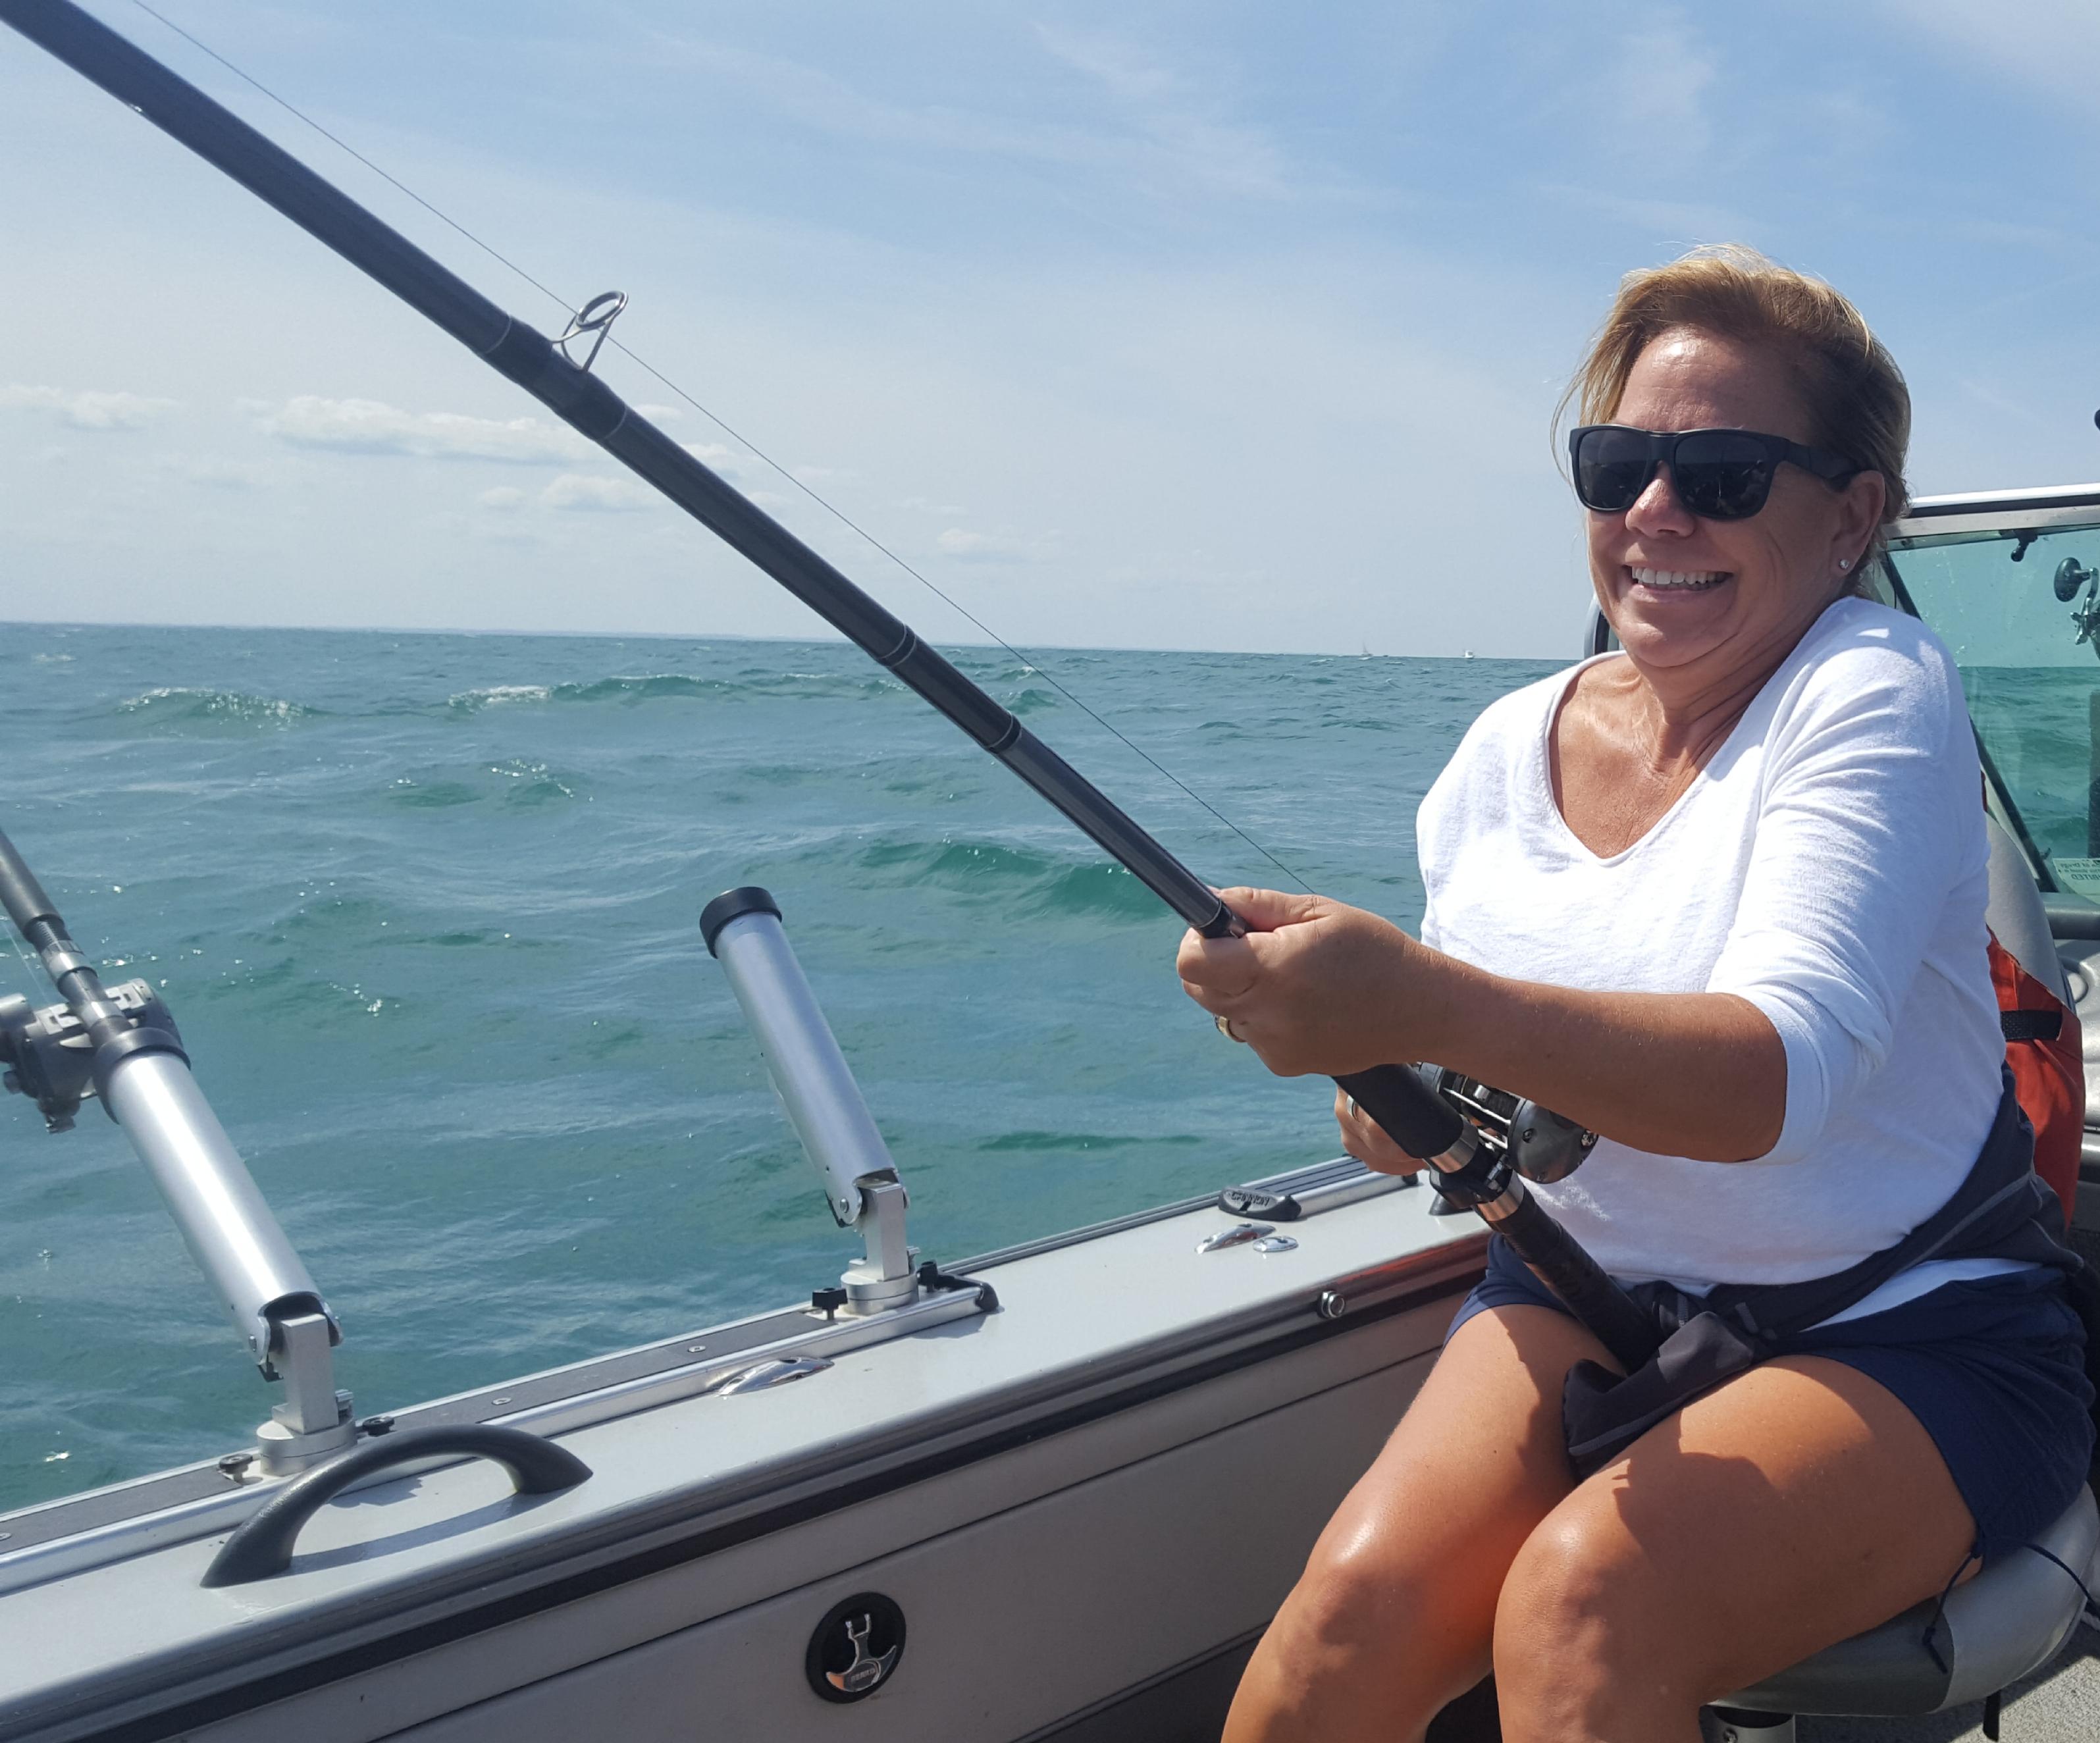 Lake ontario lake erie guided fishing charters 1st for Fishing charters buffalo ny